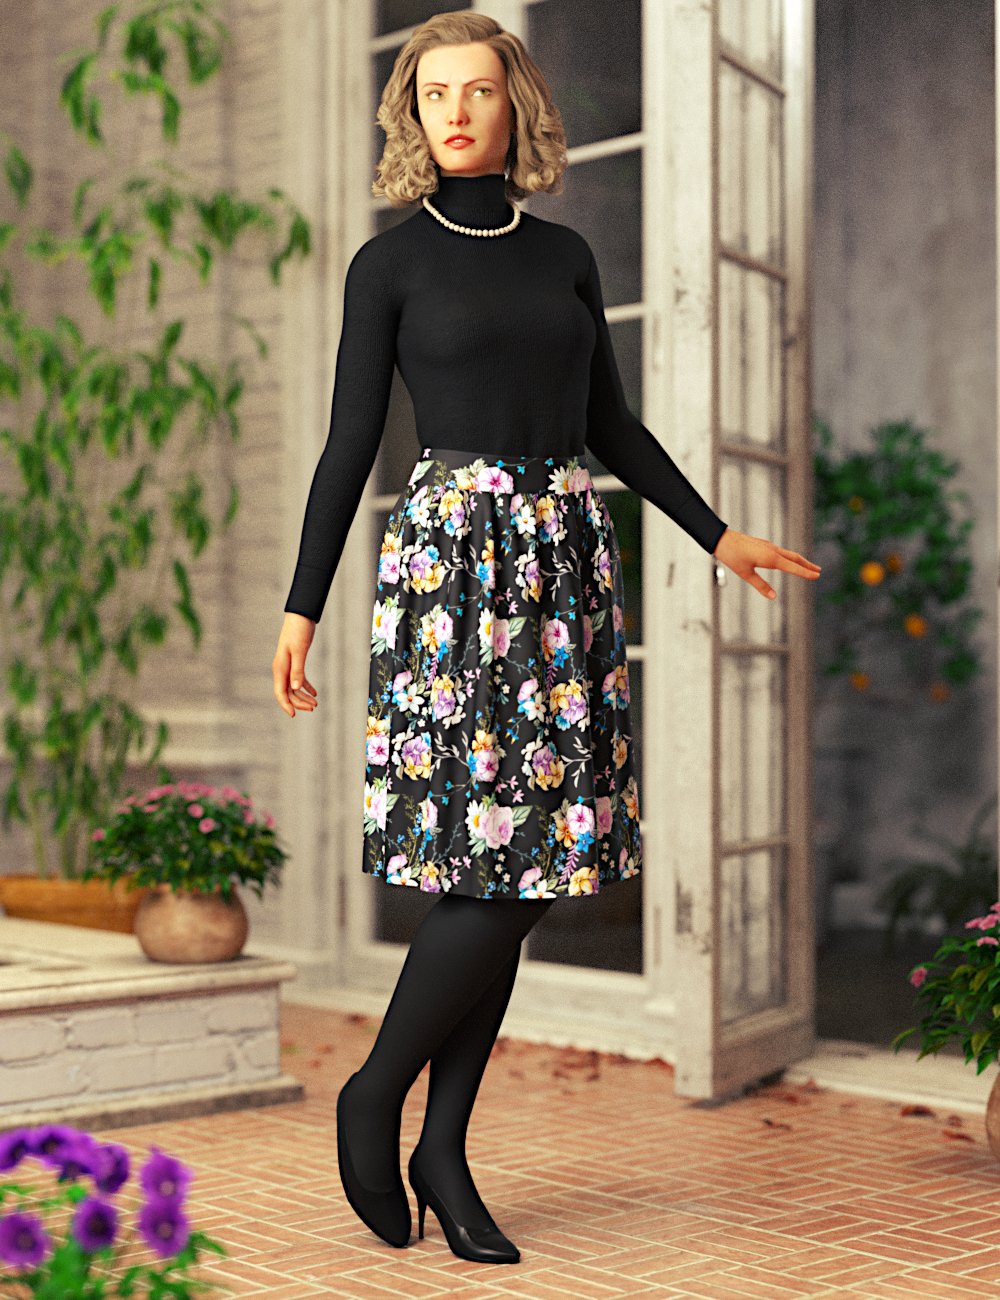 dForce Margita Outfit for Genesis 8 Female(s) by: Toyen, 3D Models by Daz 3D